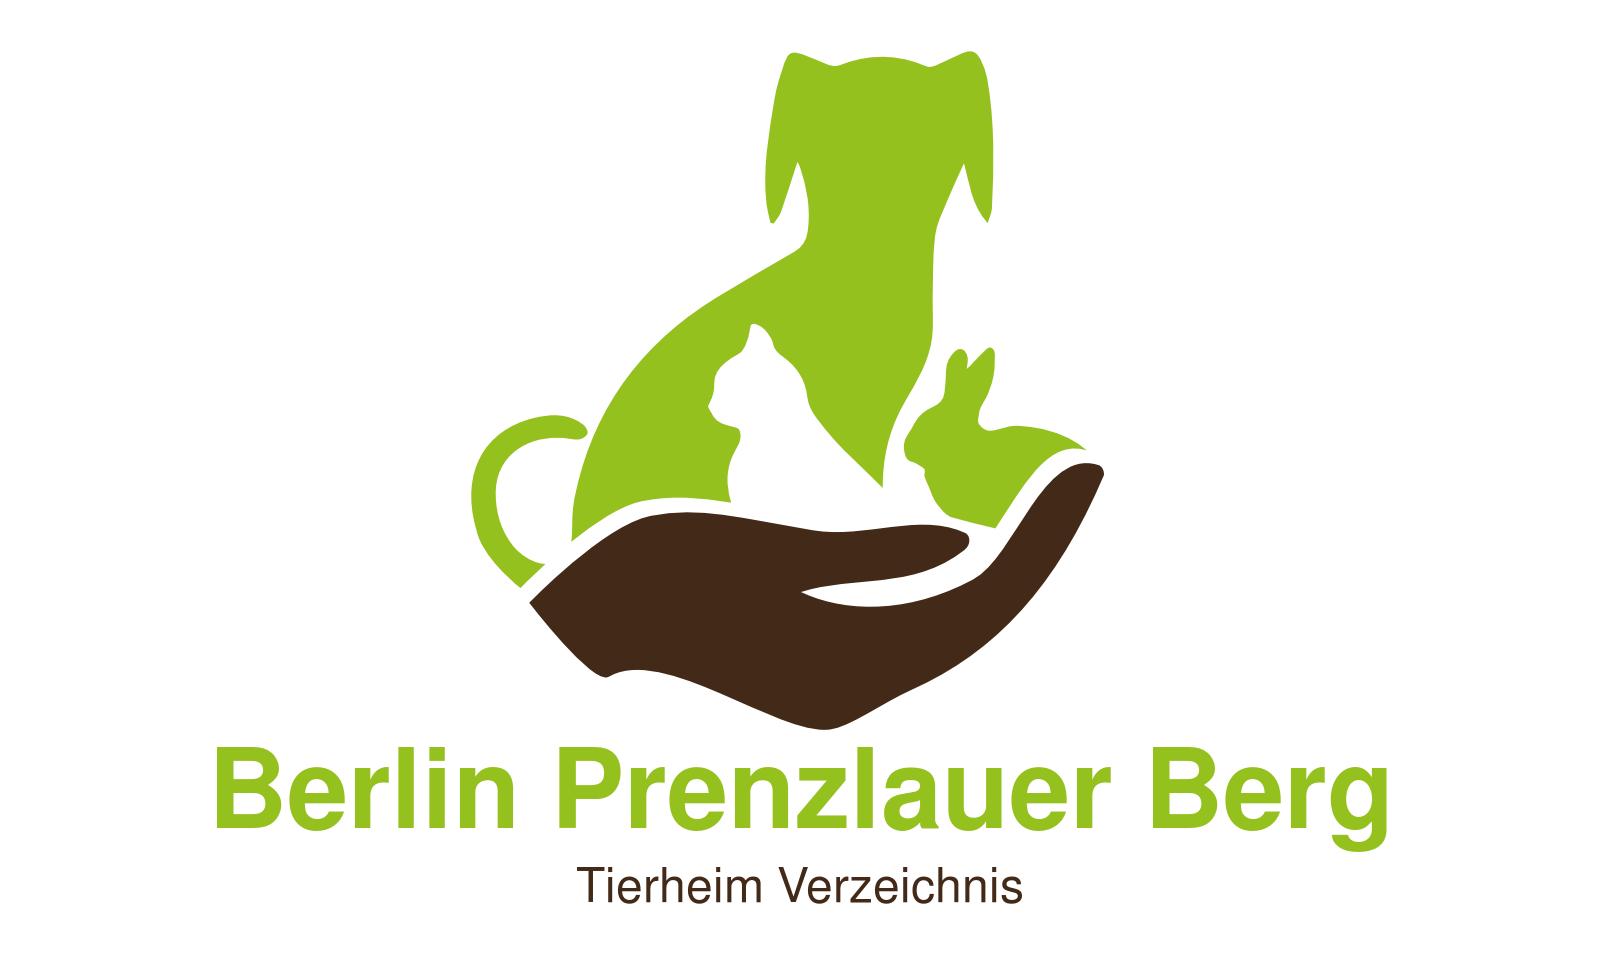 Tierheim Berlin Prenzlauer Berg